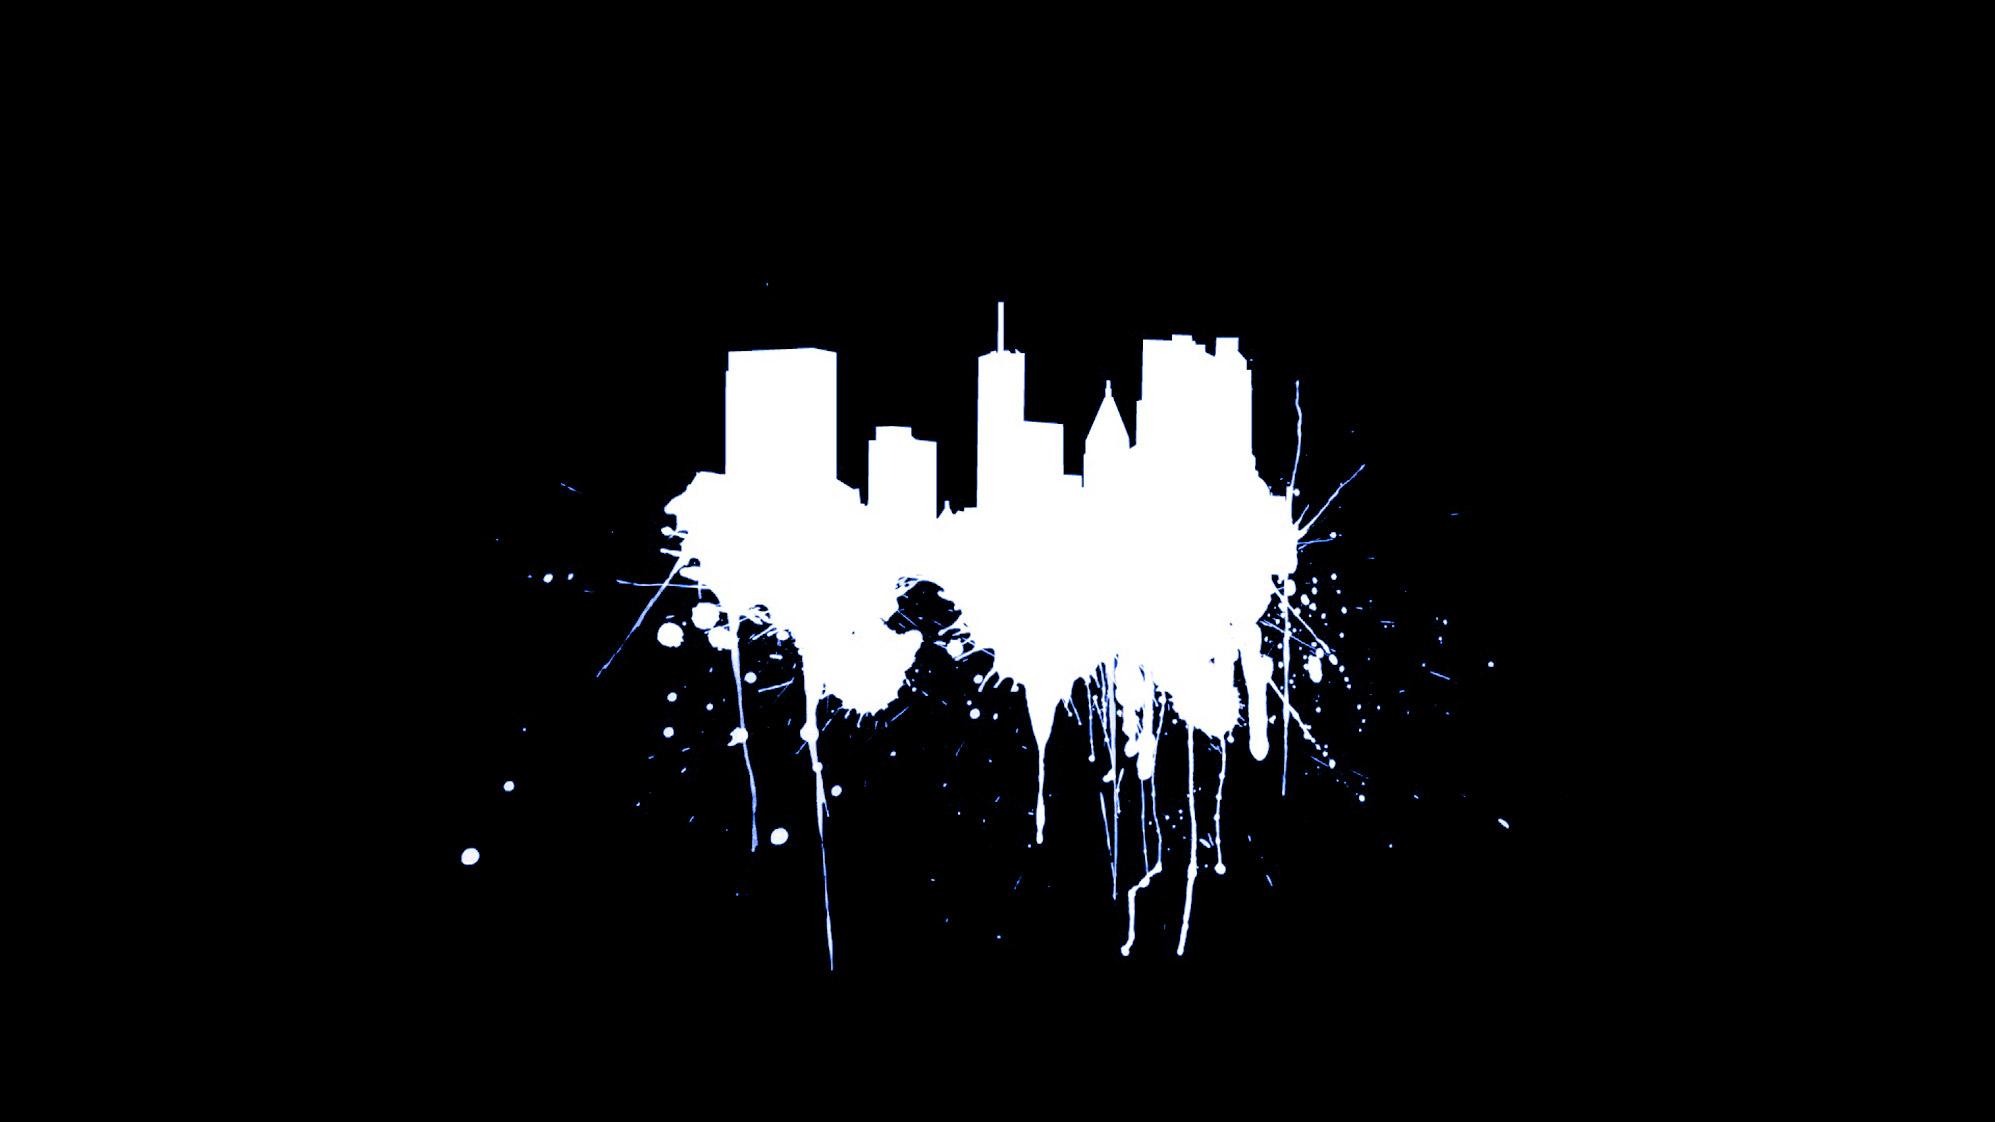 cityscape_BW